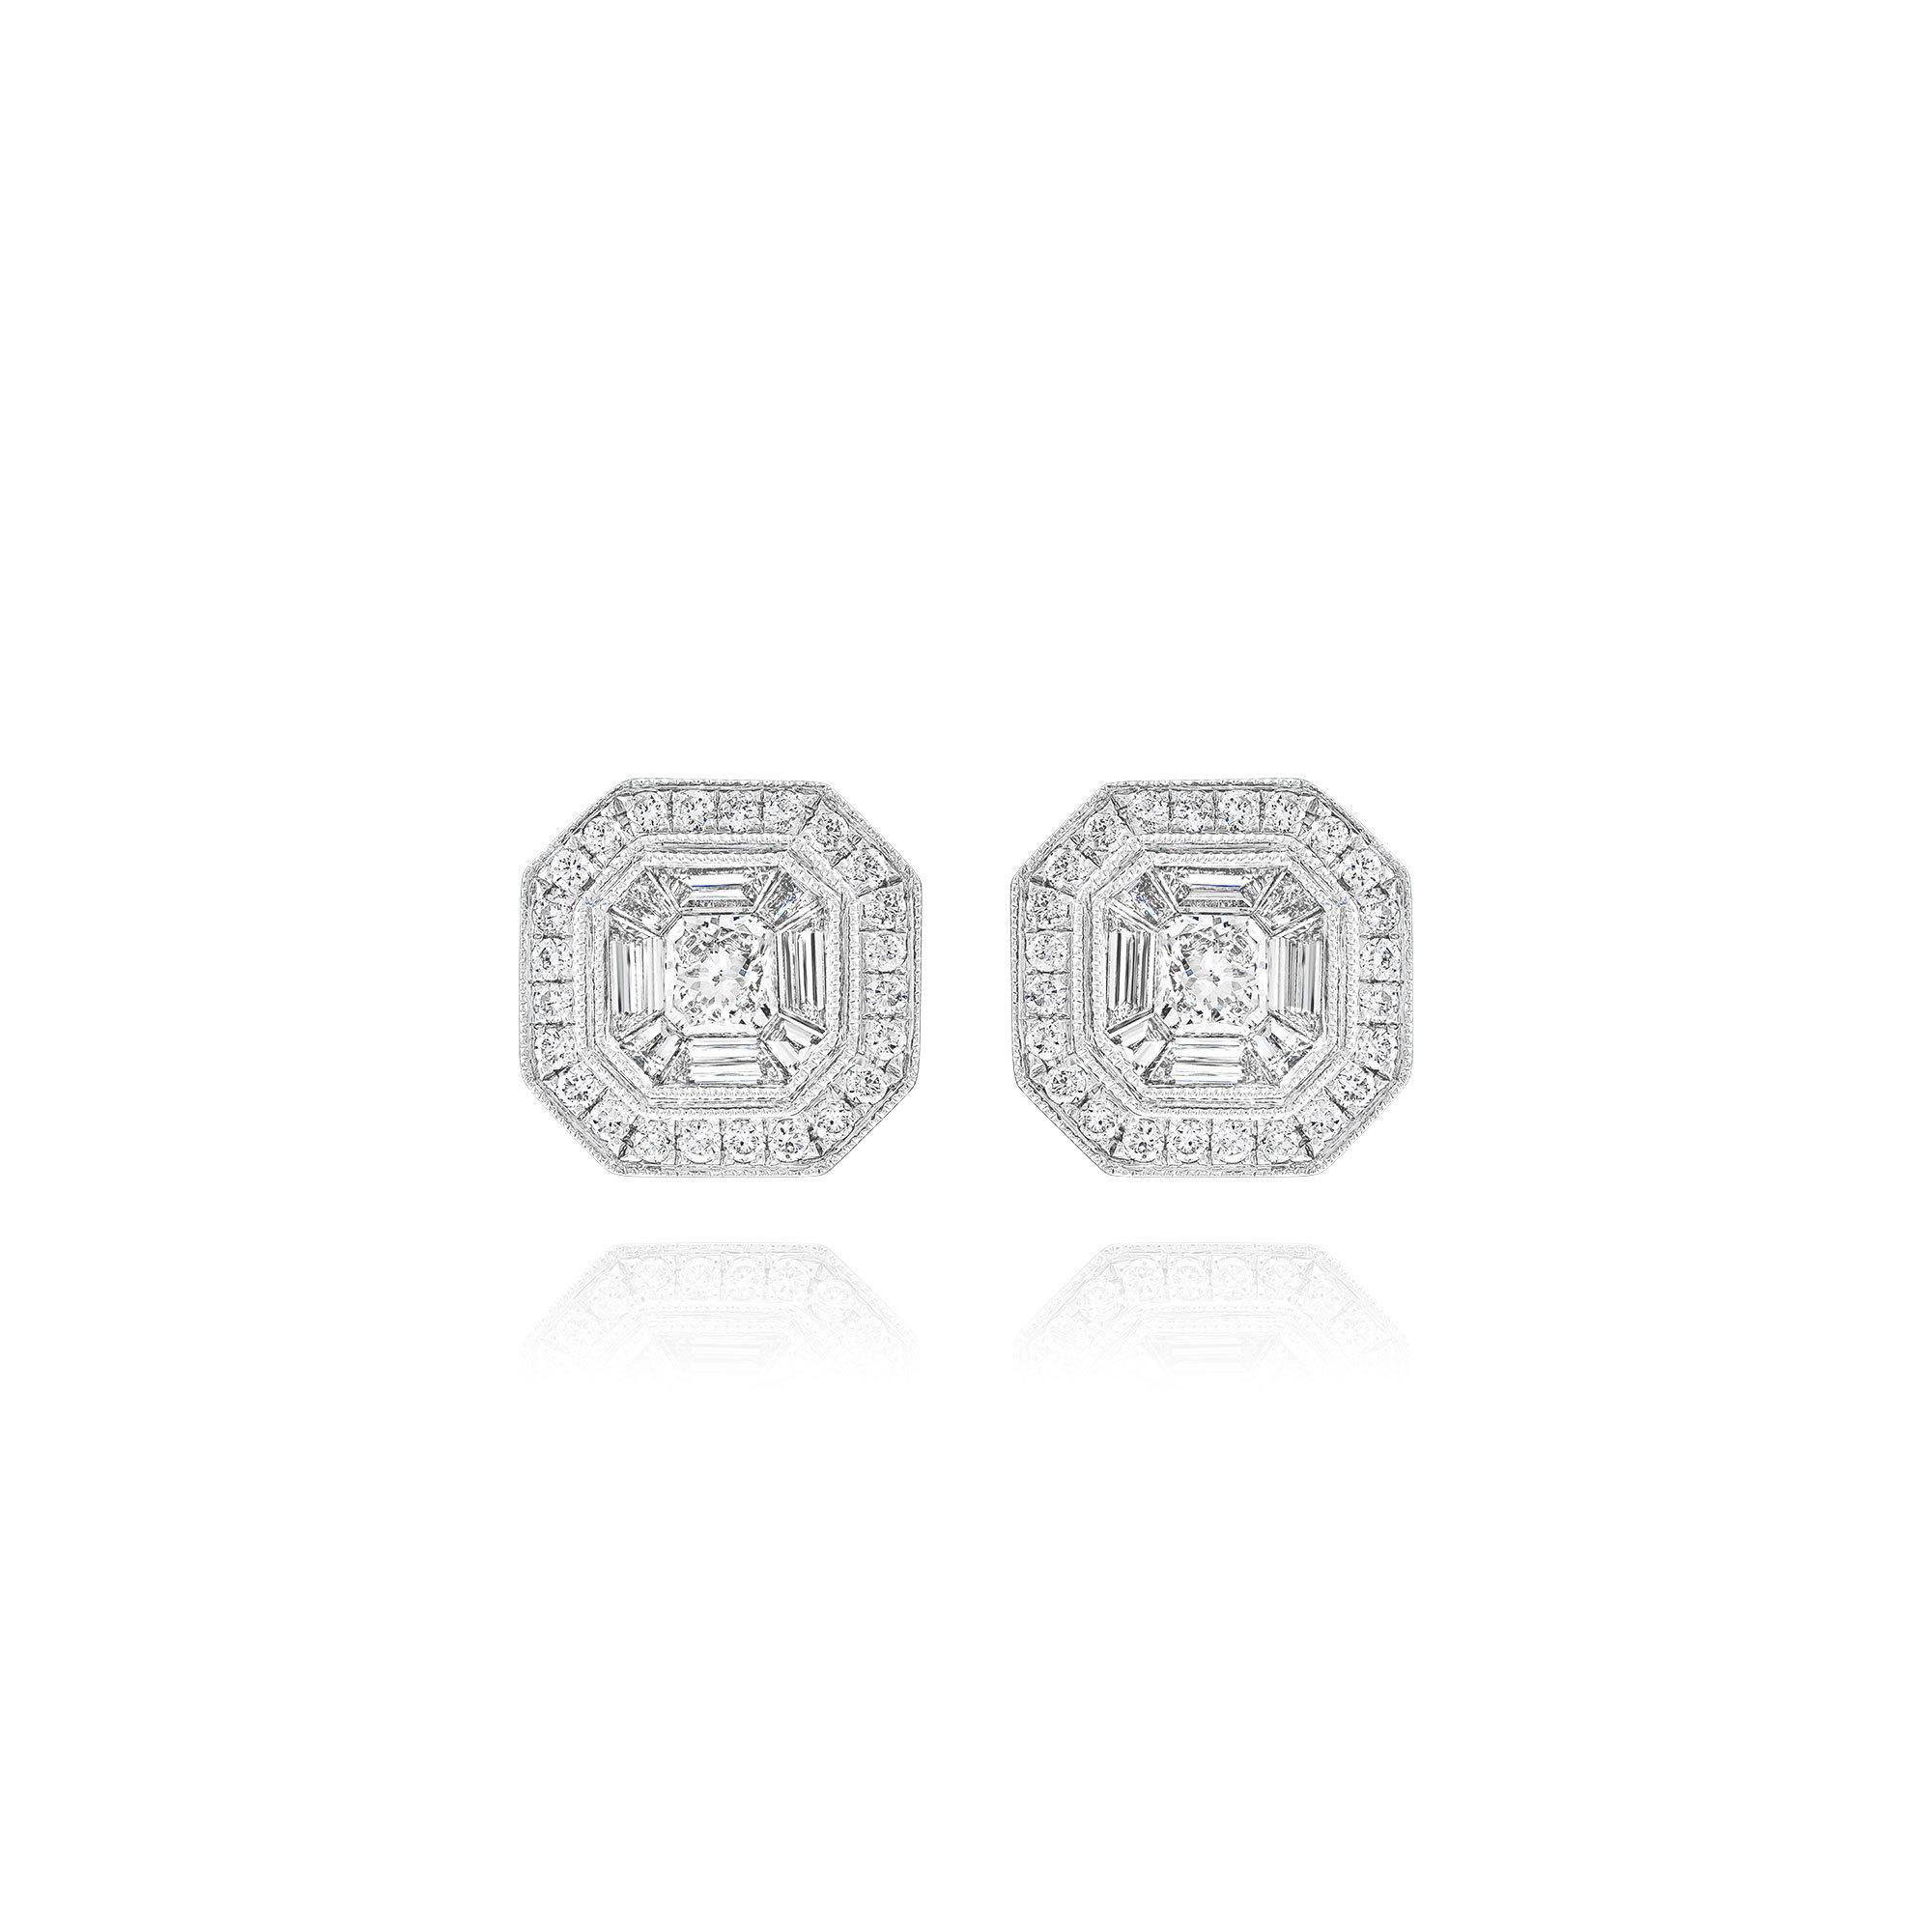 ORTAEA Bridal Earrings